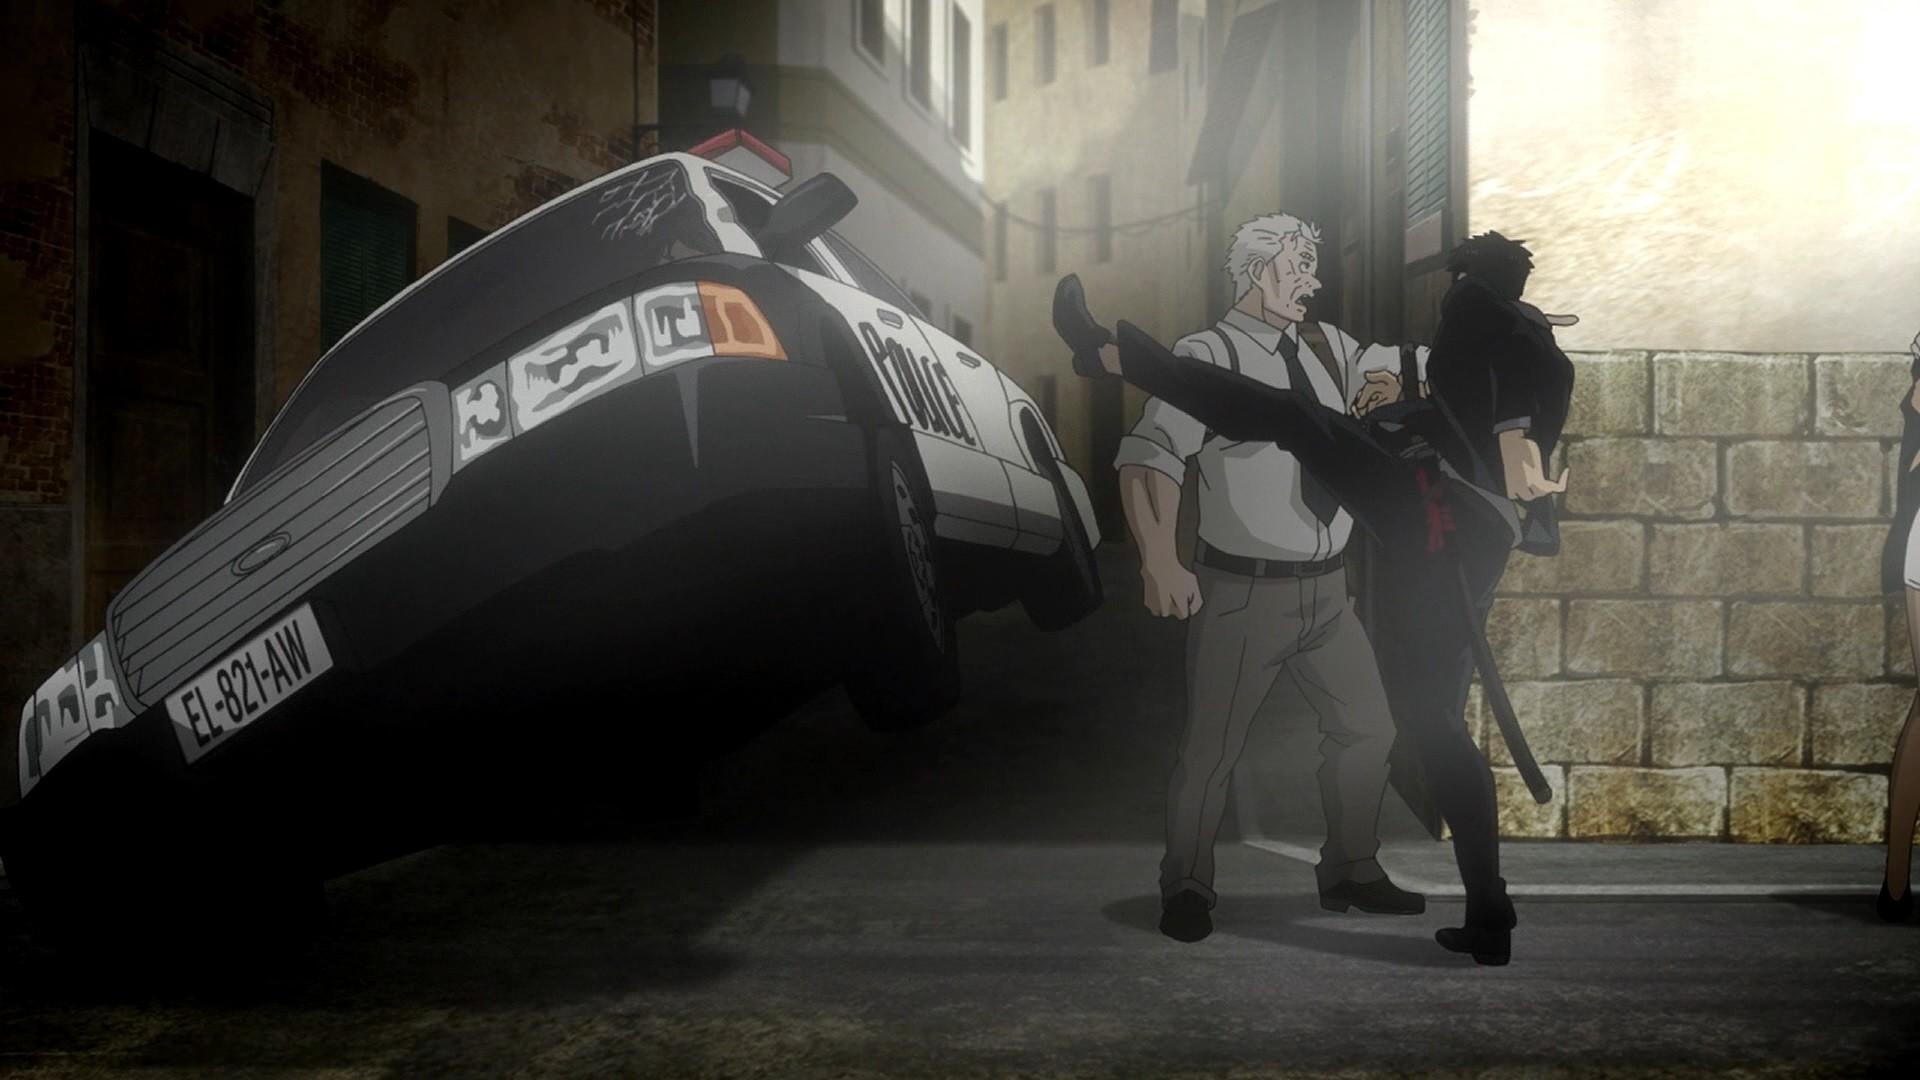 Gangsta. Nicolas Worick